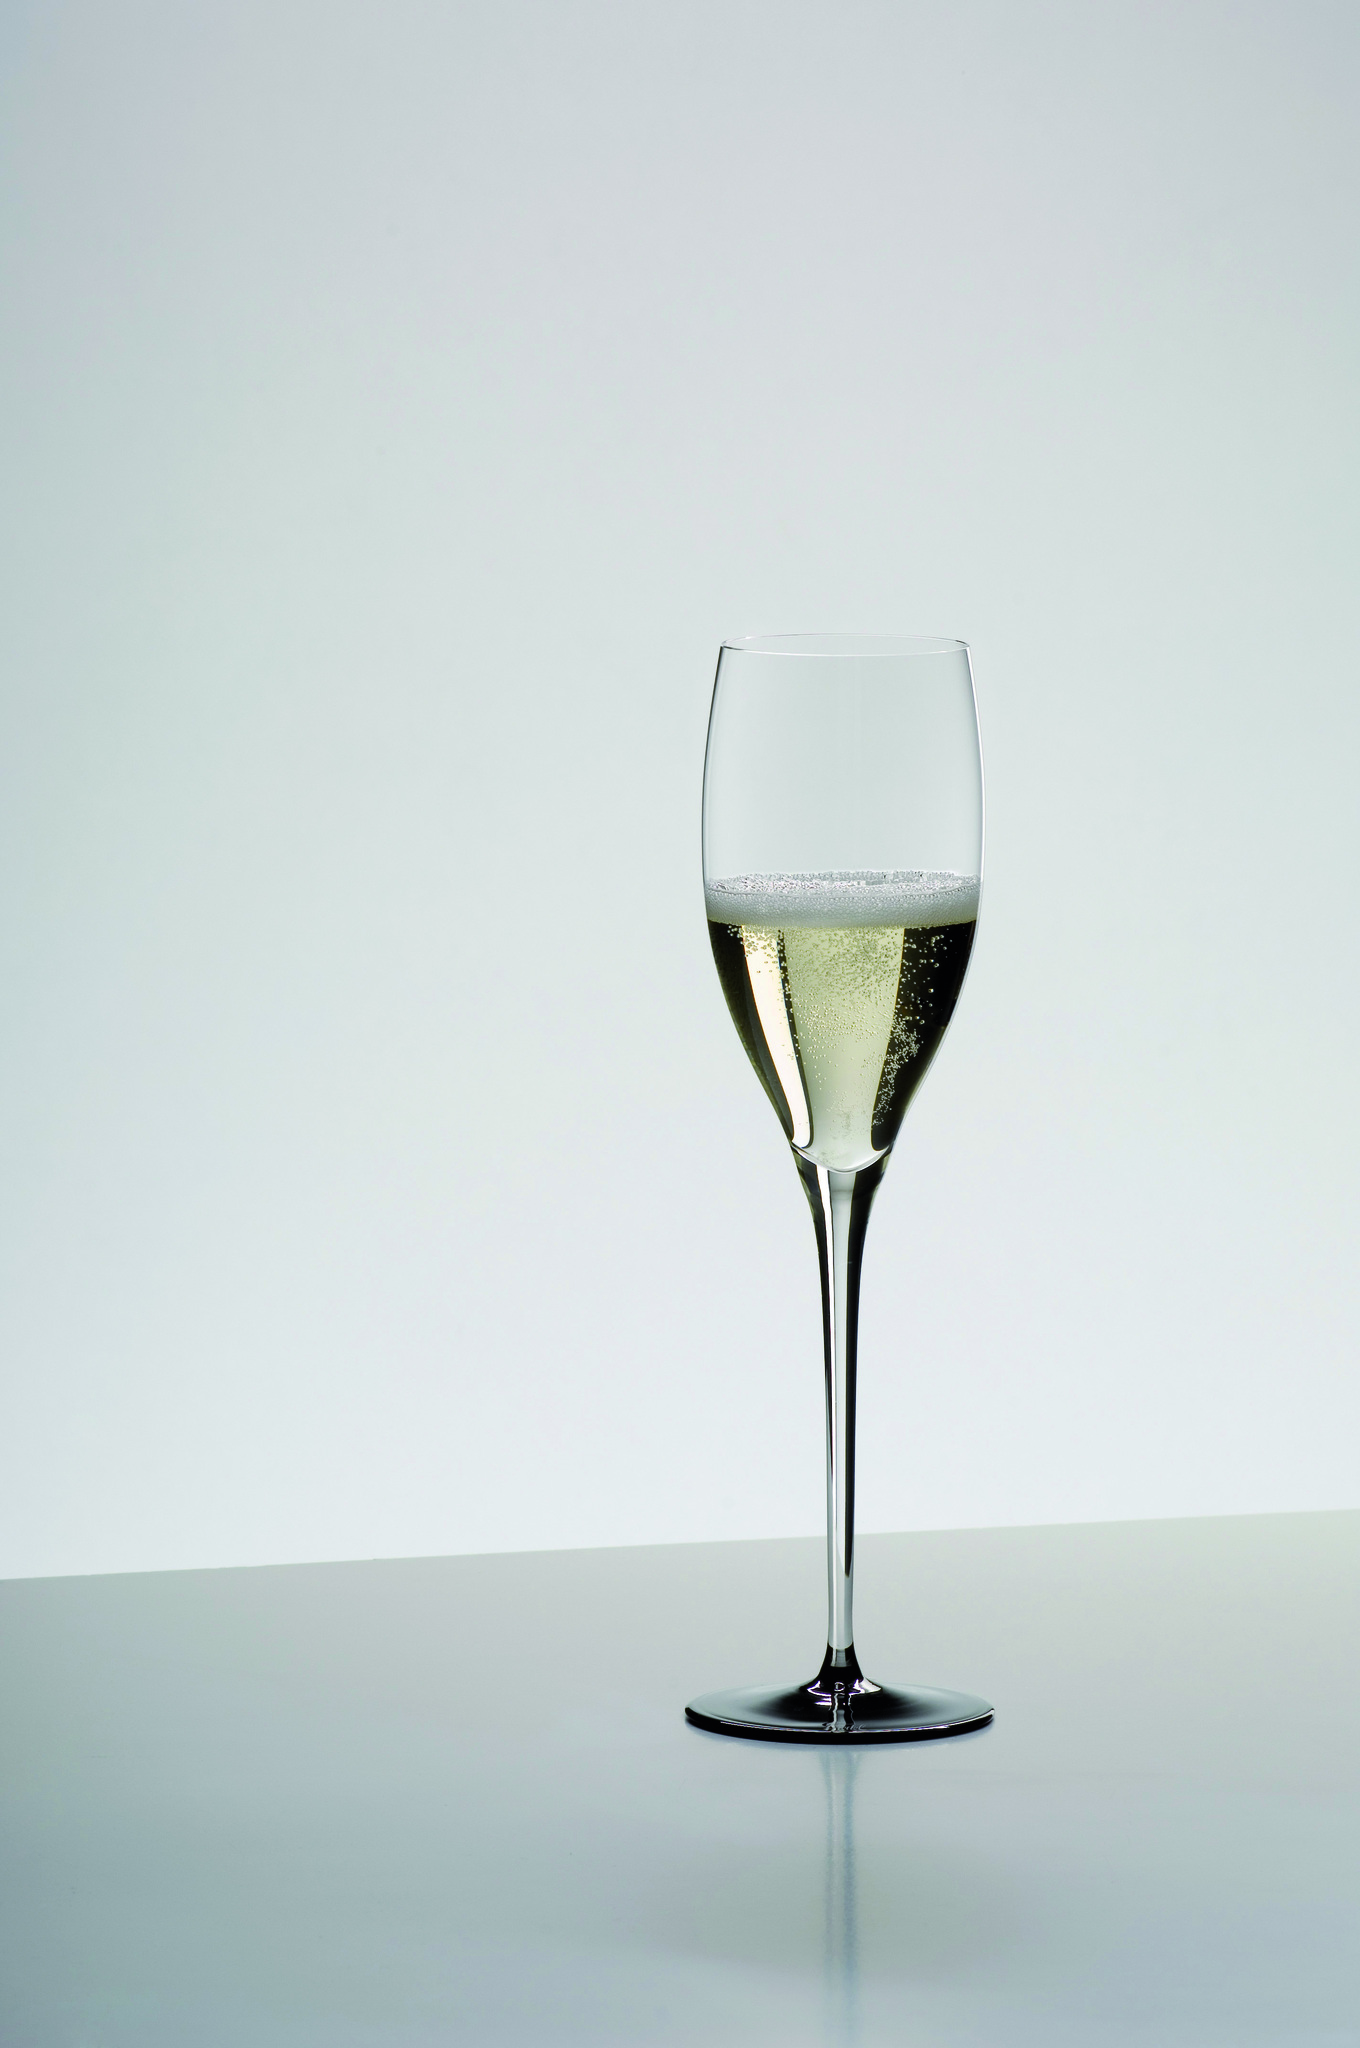 Бокалы Бокал для шампанского 330мл Riedel Sommeliers Black Tie Vintage Champagne bokal-dlya-shampanskogo-330-ml-riedel-vintage-champagne-black-tie-avstriya.jpg